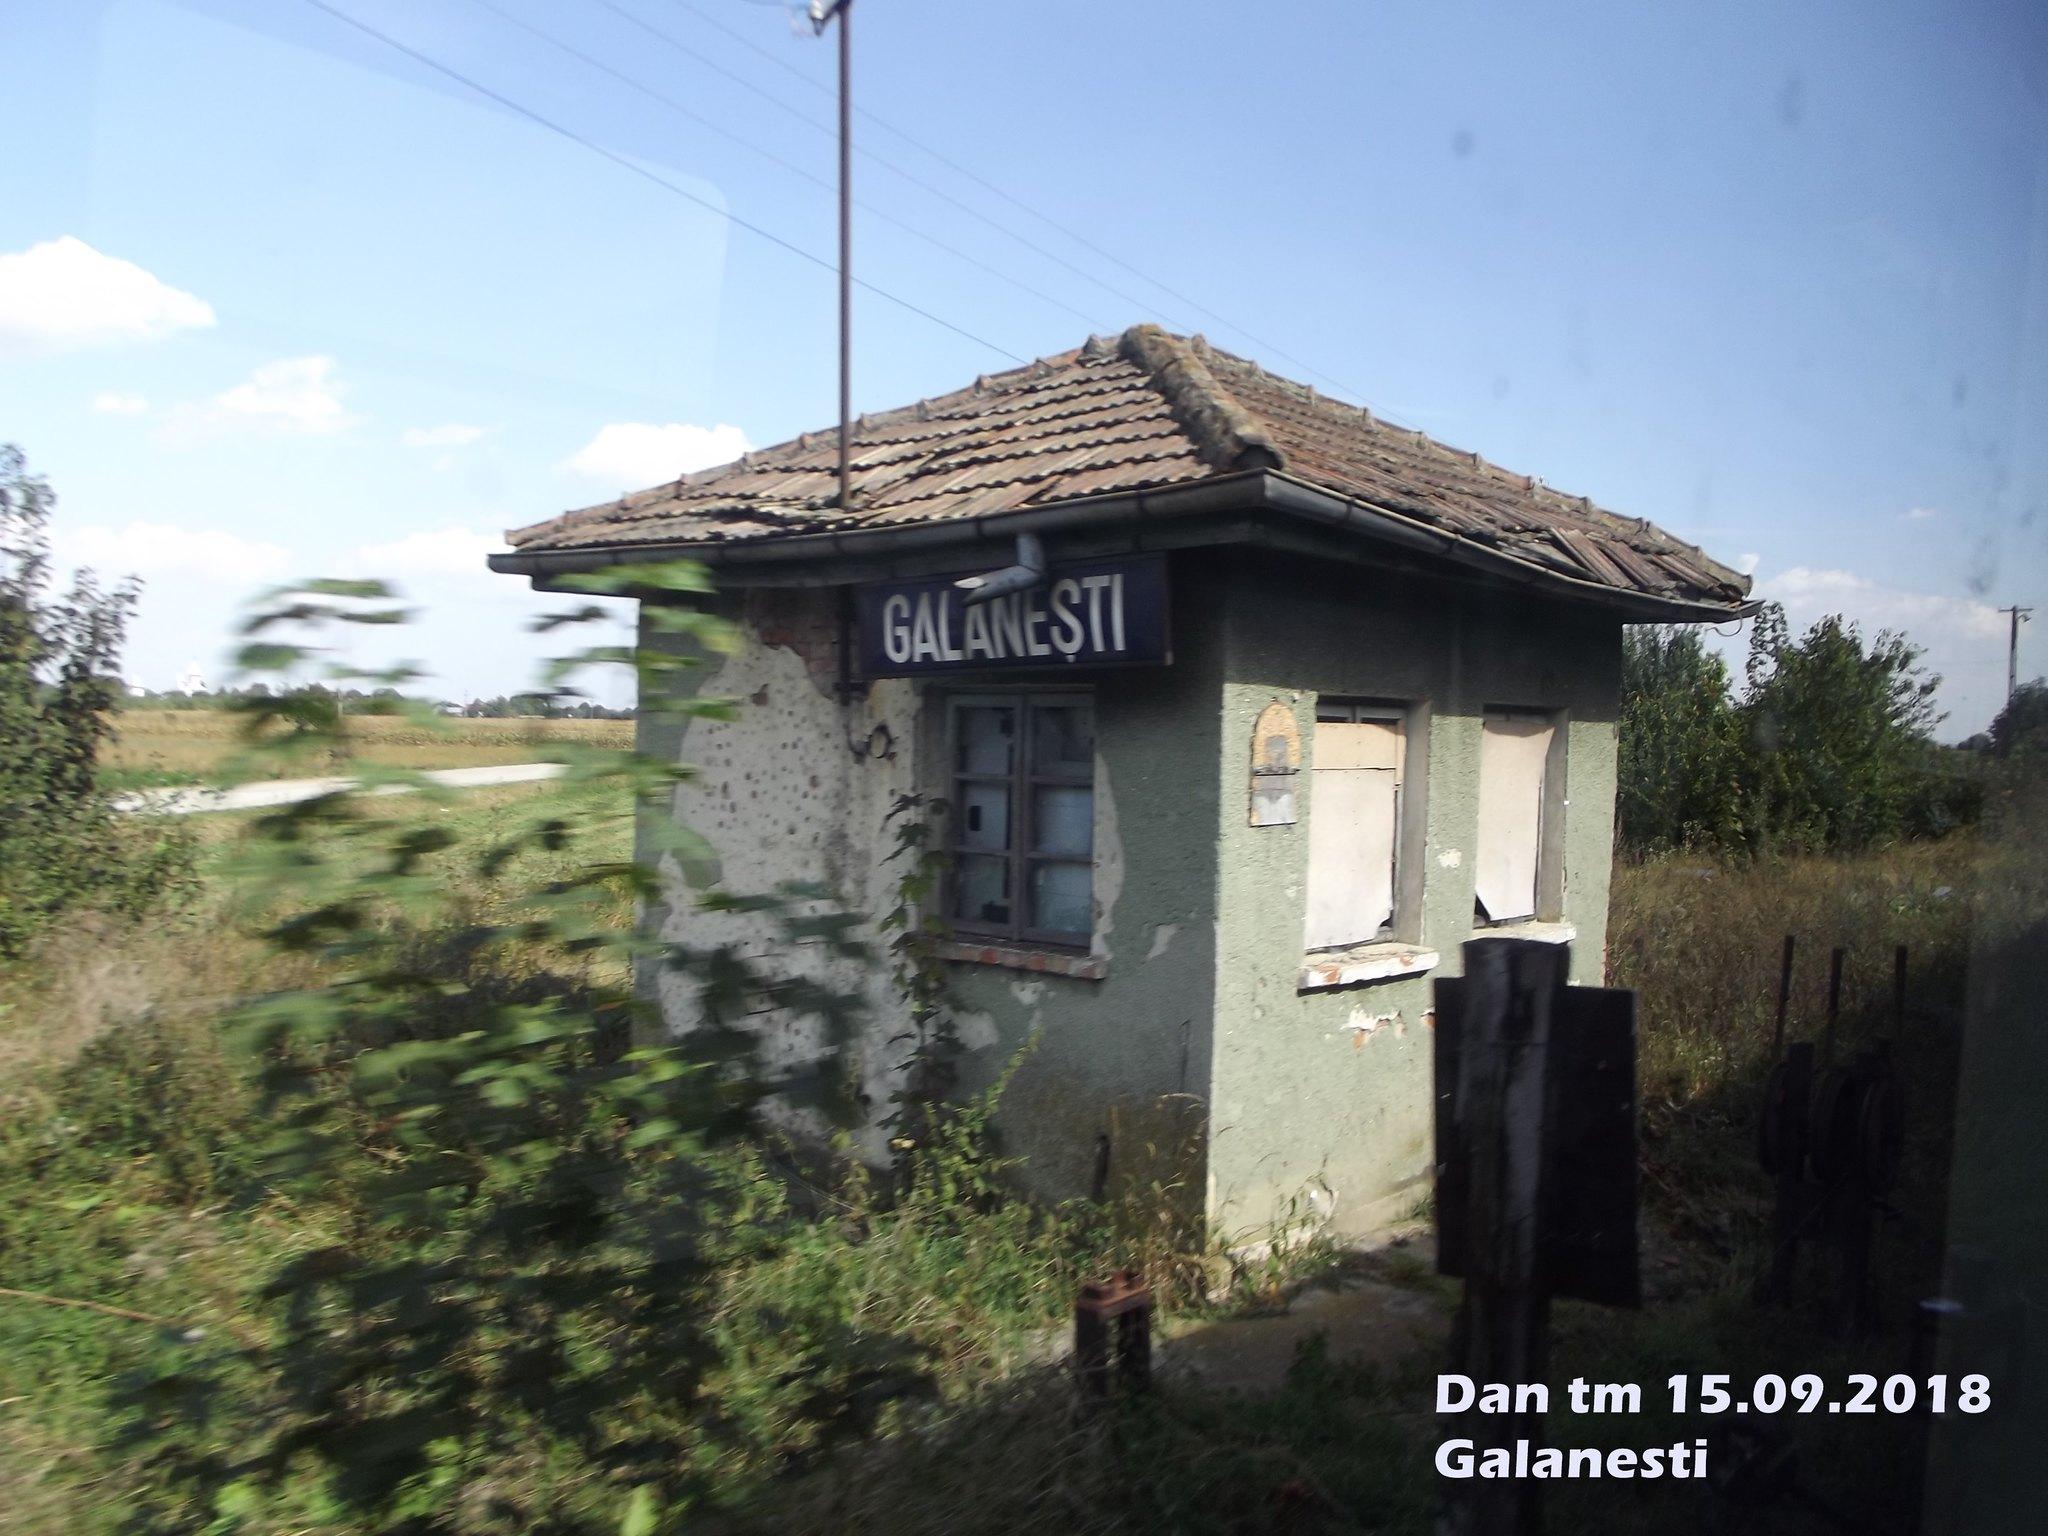 515 : Dorneşti - Gura Putnei - (Putna) - Nisipitu - Seletin UKR - Pagina 47 44685365292_a1bb3d728a_k